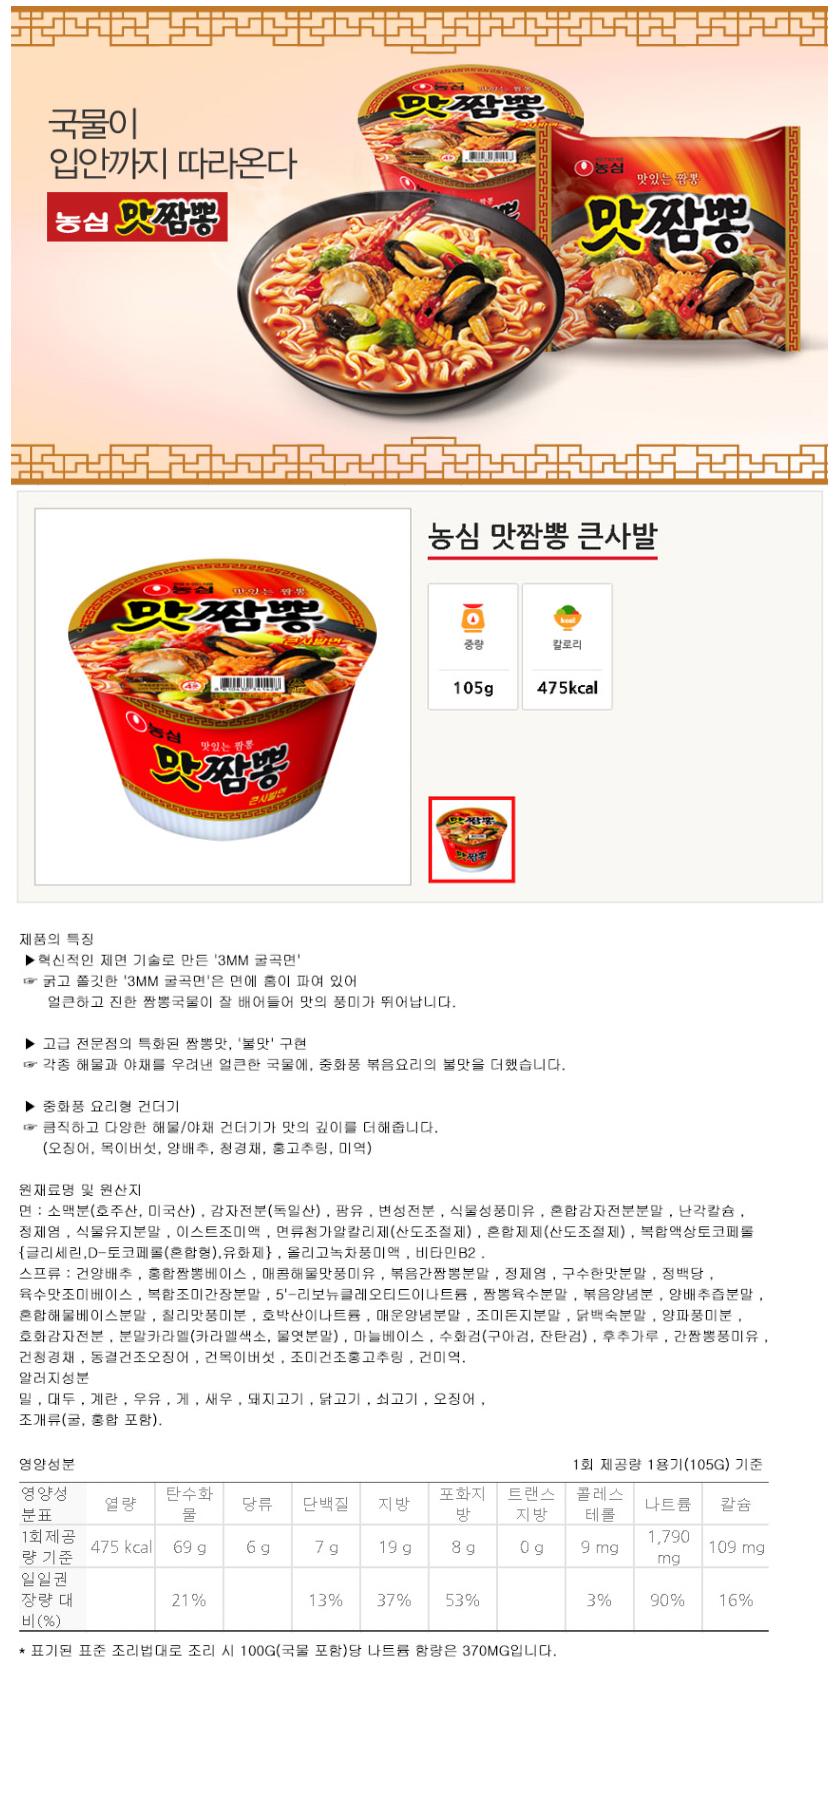 [ NongShim ] 颜色鲜红大杯方便面105gX4P